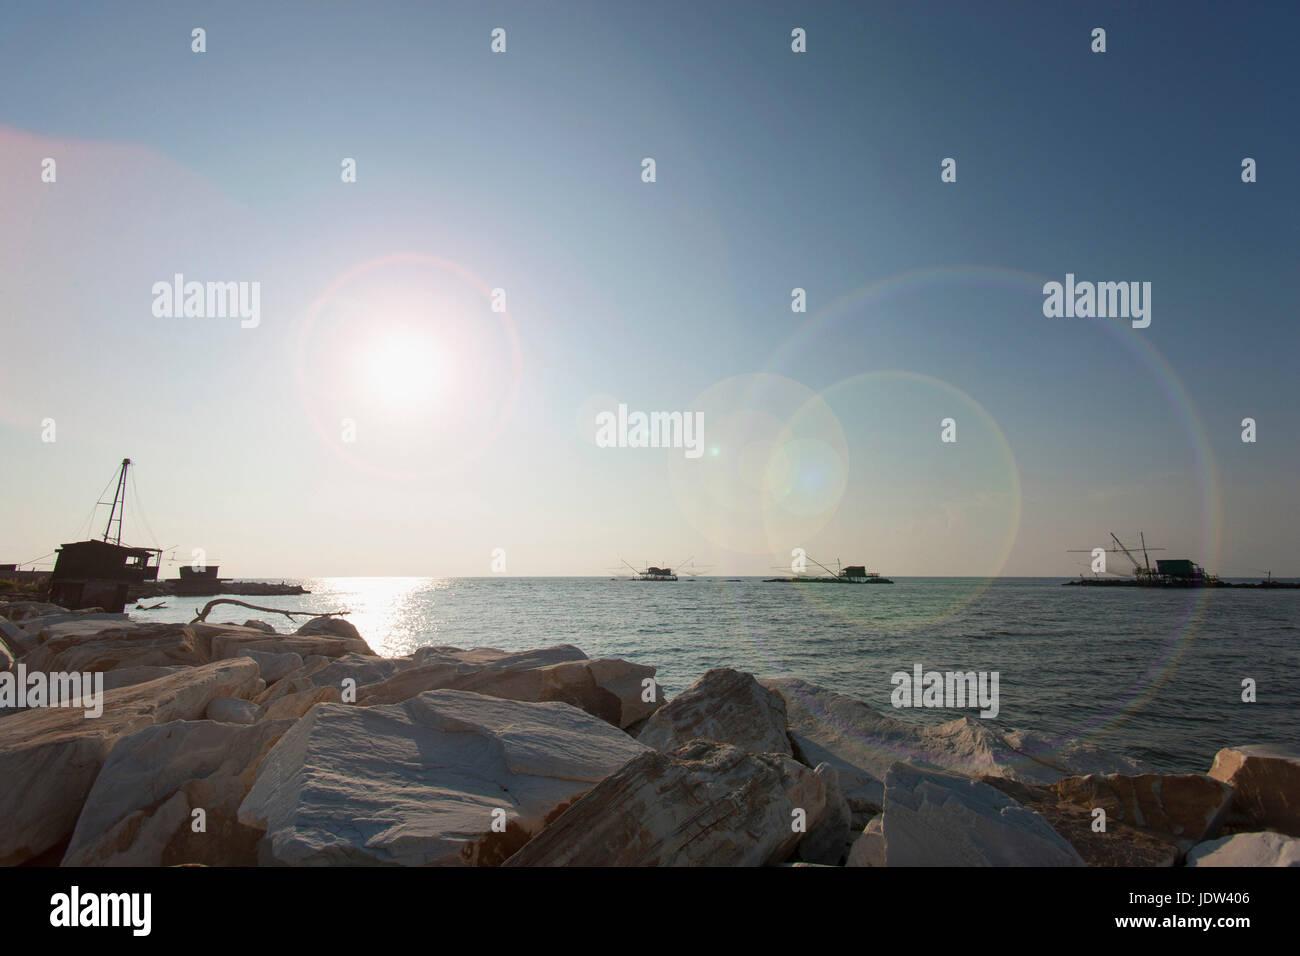 Coast, Lagune, Pisa, Tuscany, Italy - Stock Image